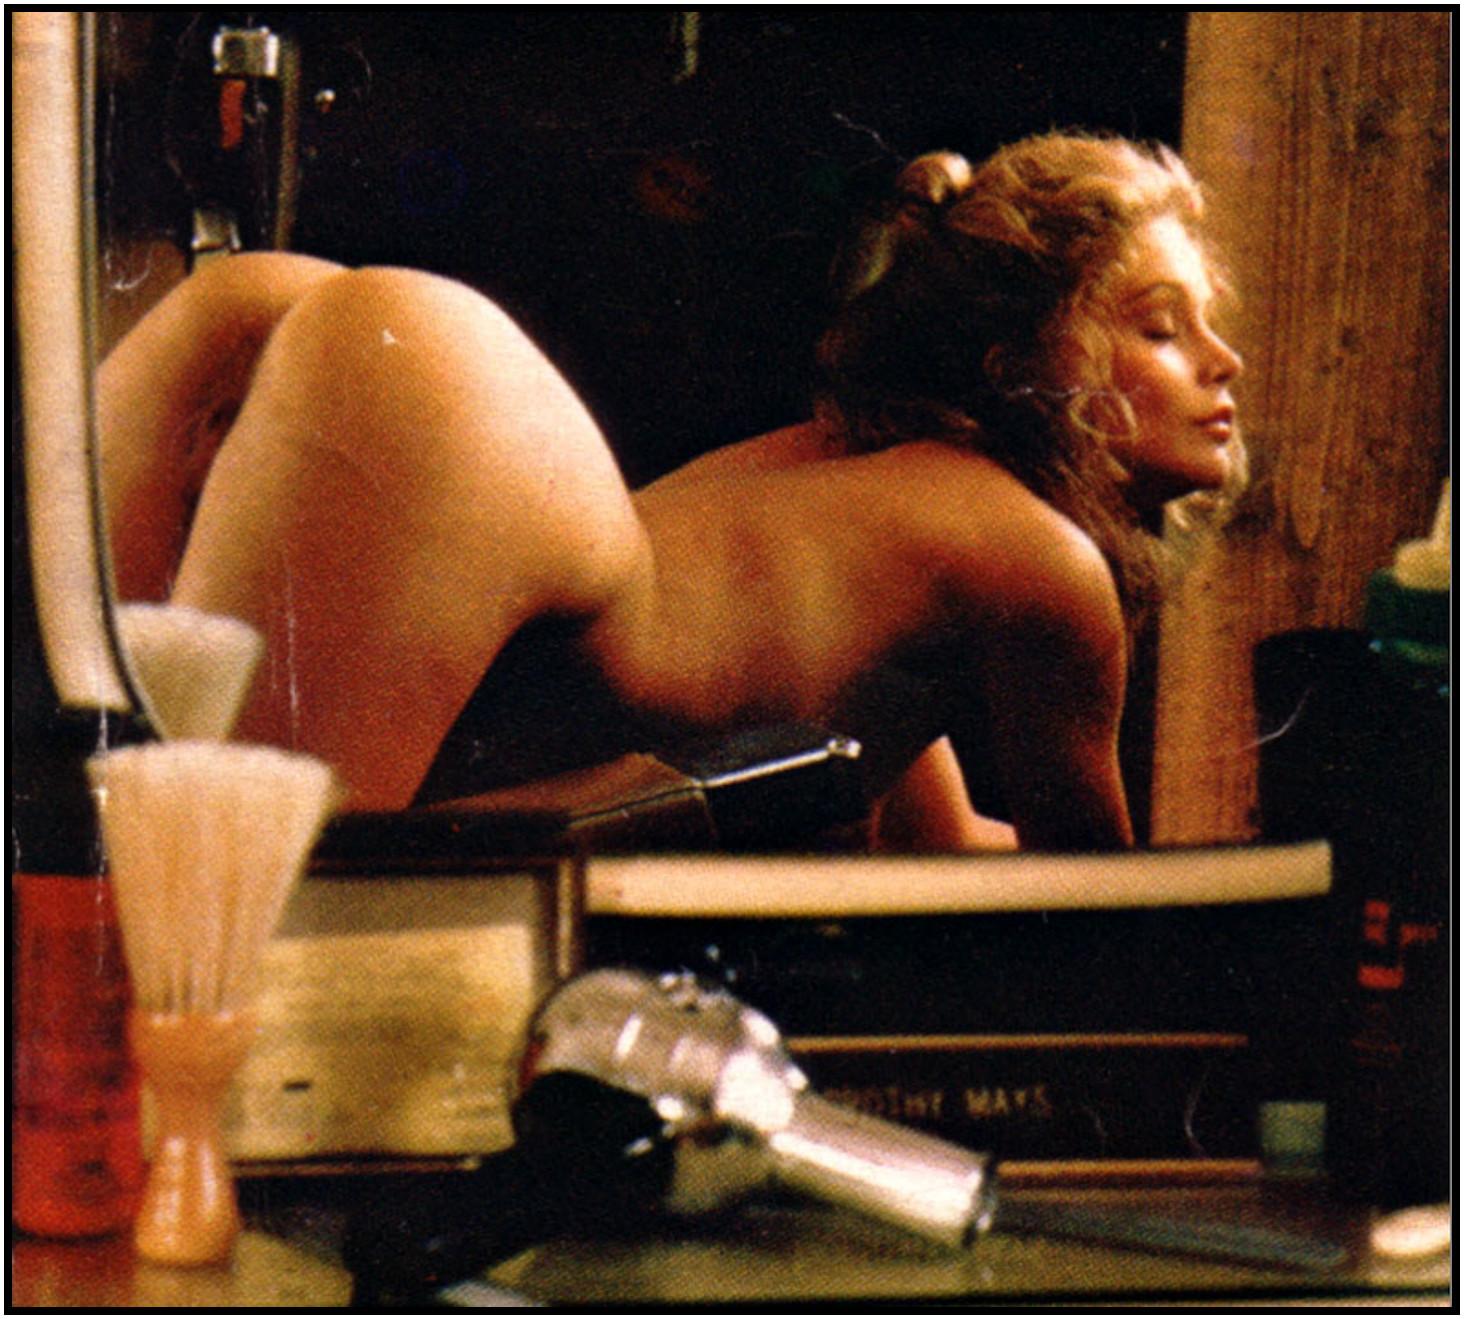 dorothy mays nude